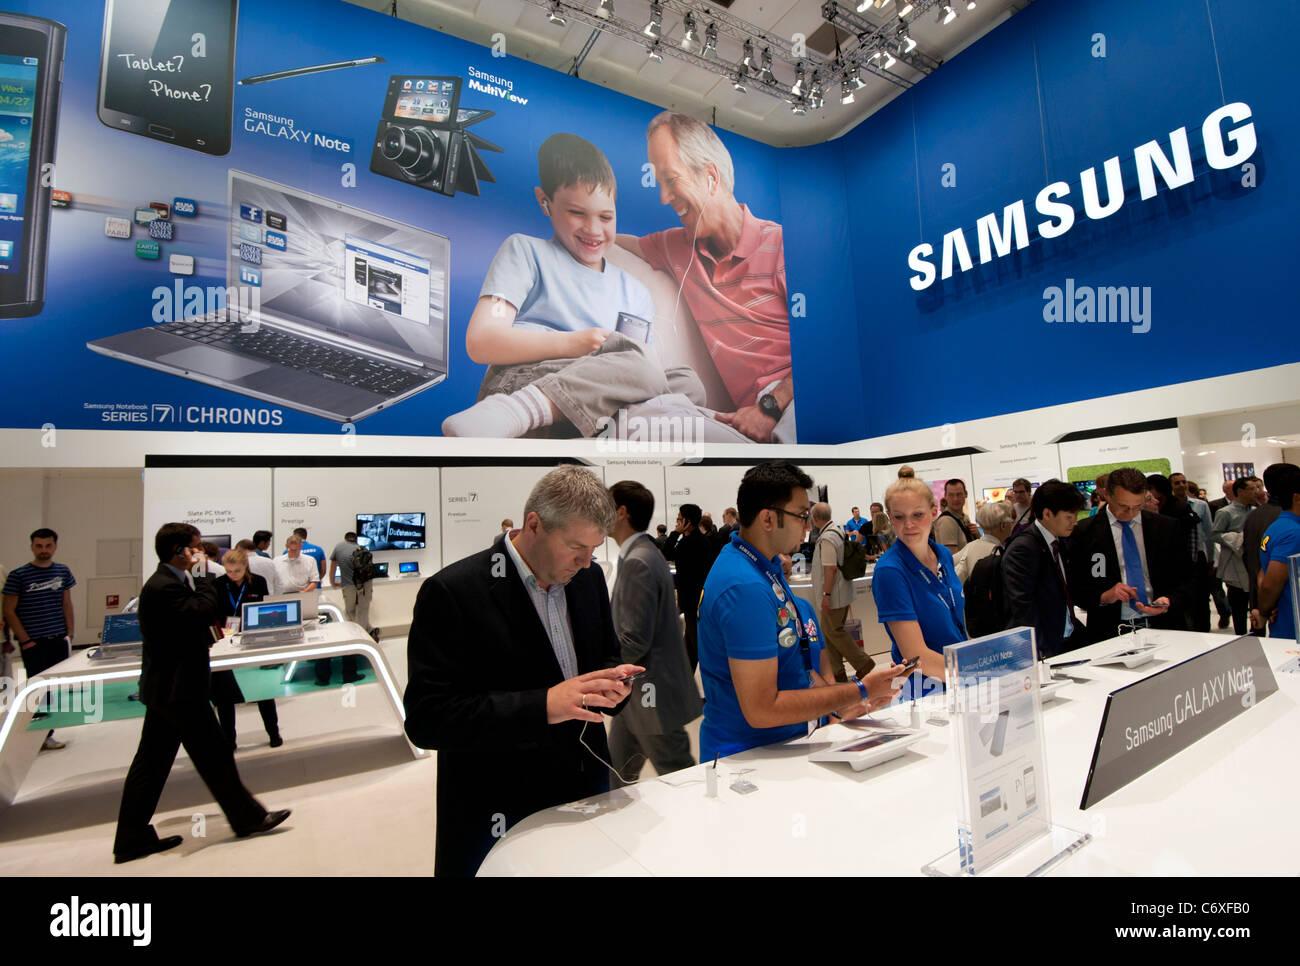 Samsung display stand a IFA consumer electronics fiera commerciale di Berlino Germania 2011 Immagini Stock